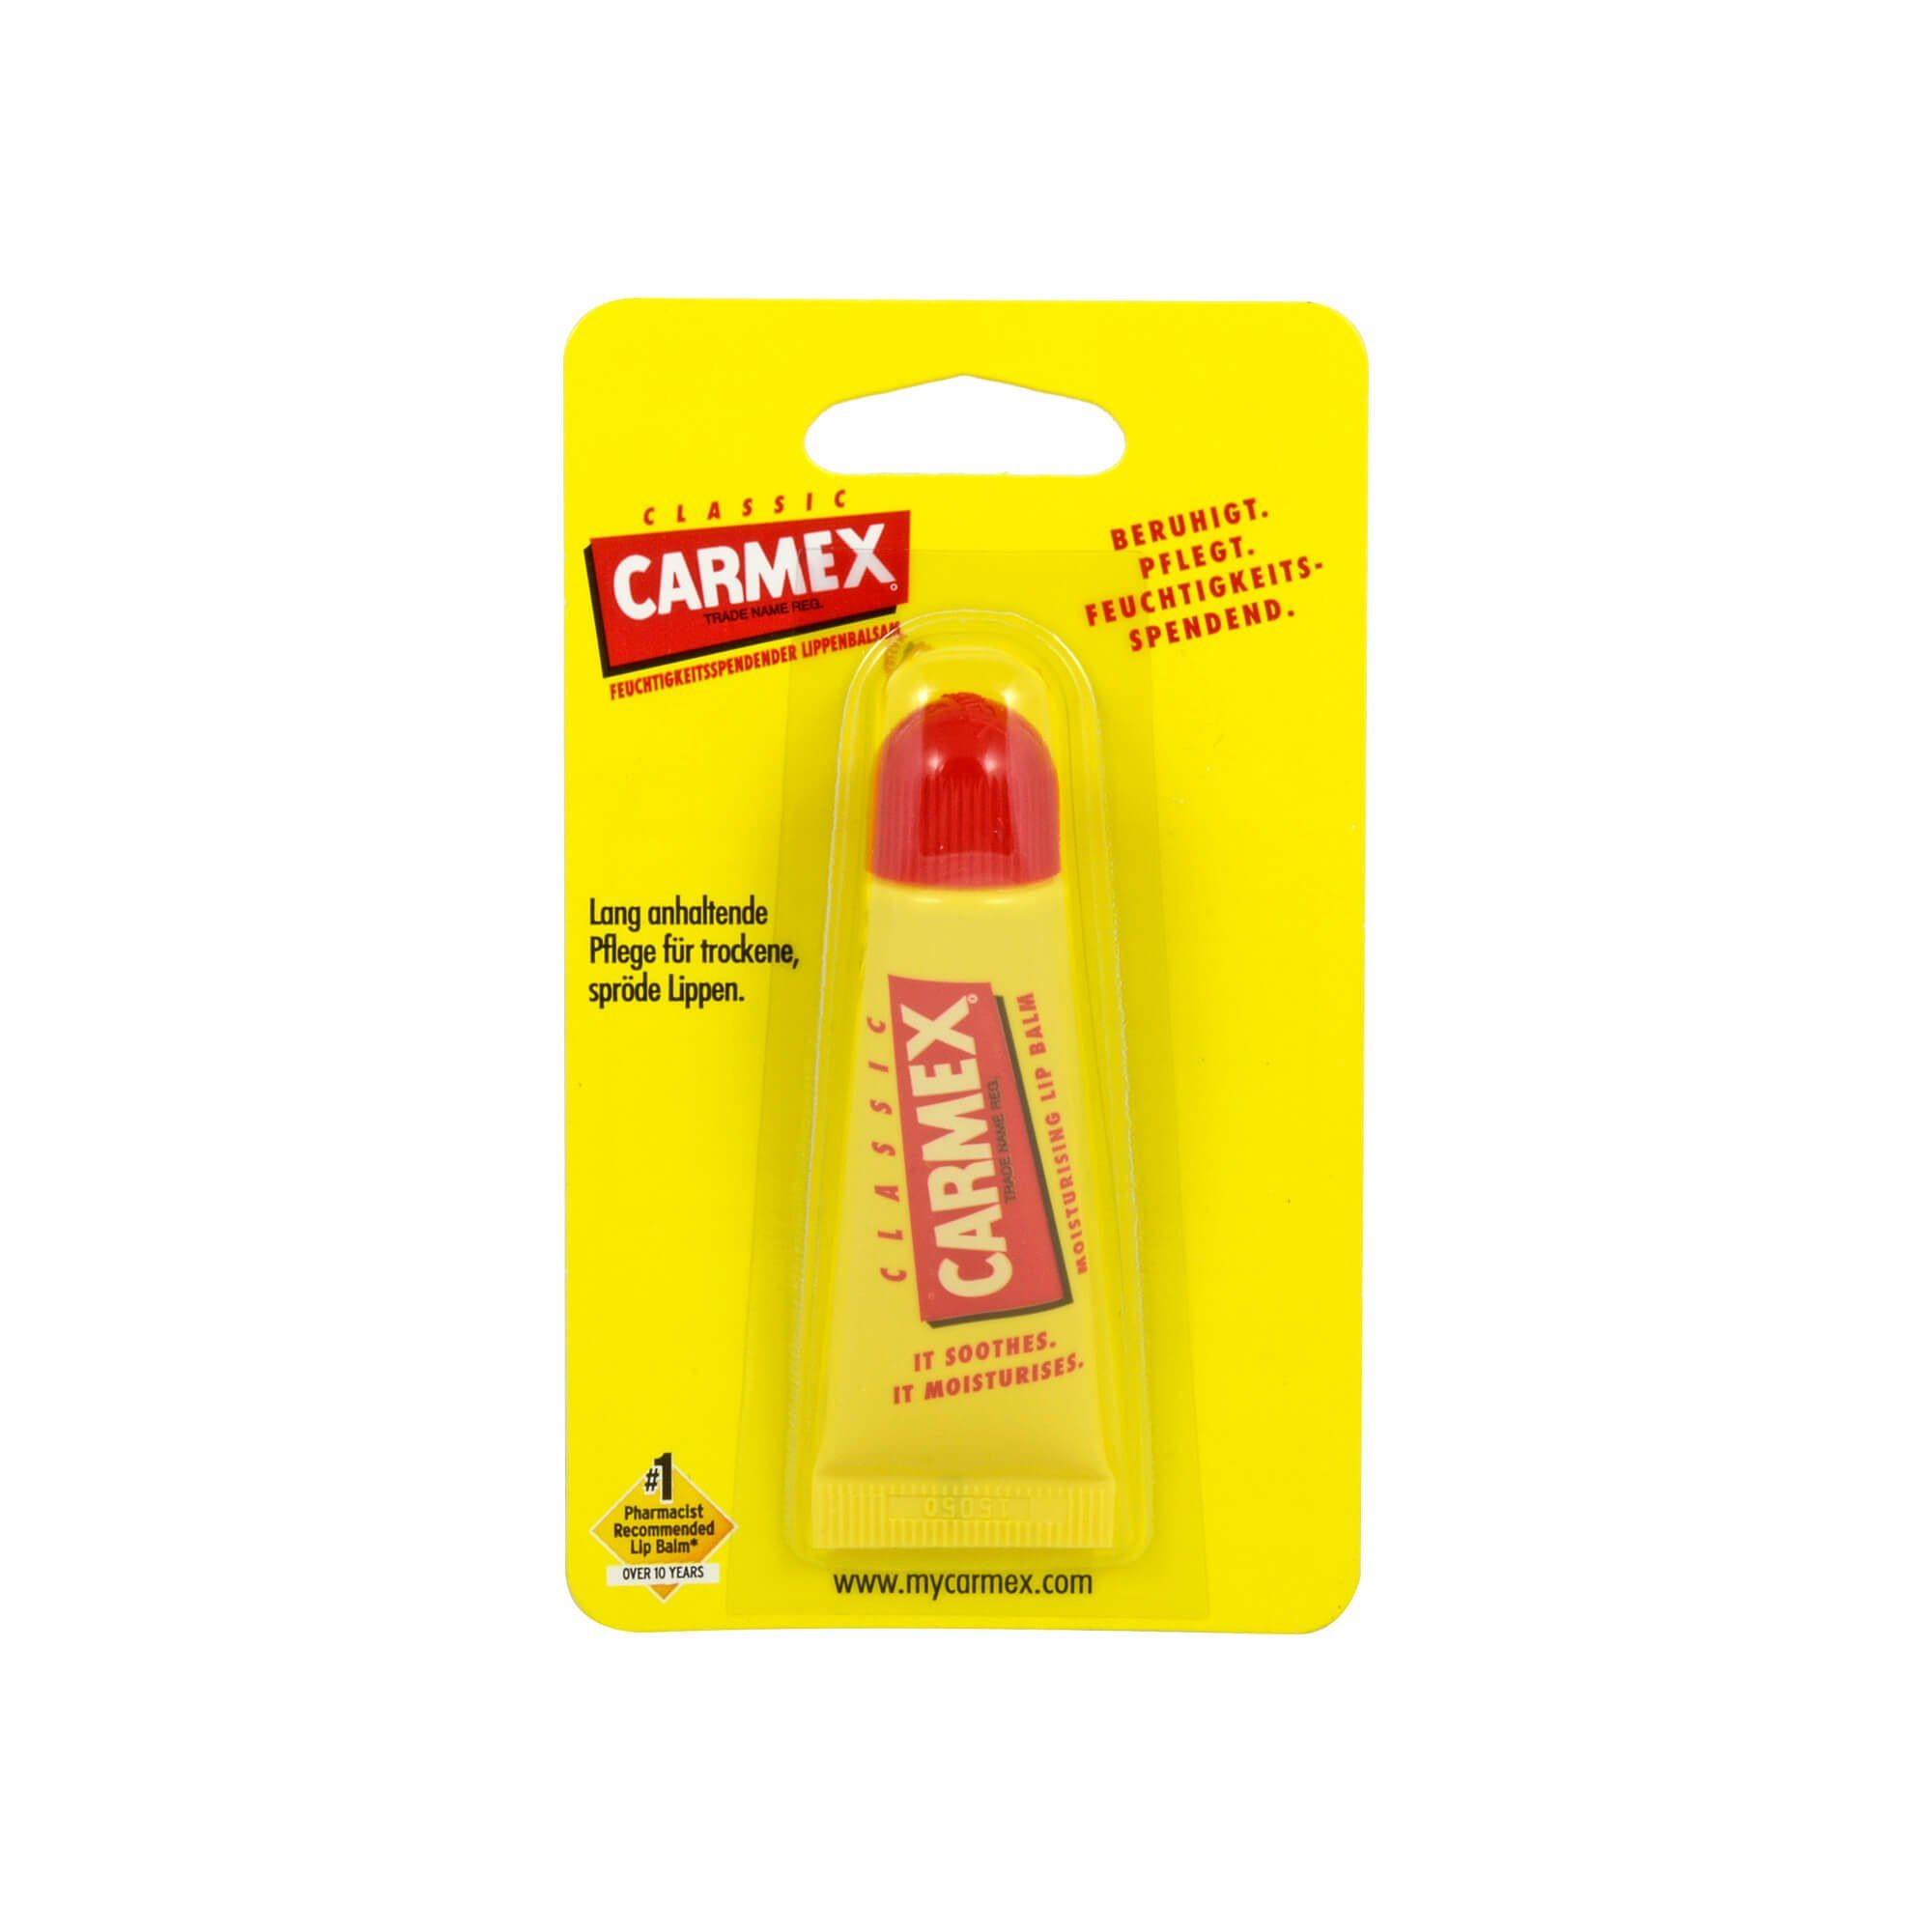 Carmex Lippenbalsam für Trockene Spröde Lippen Stick (, 4.25 g)